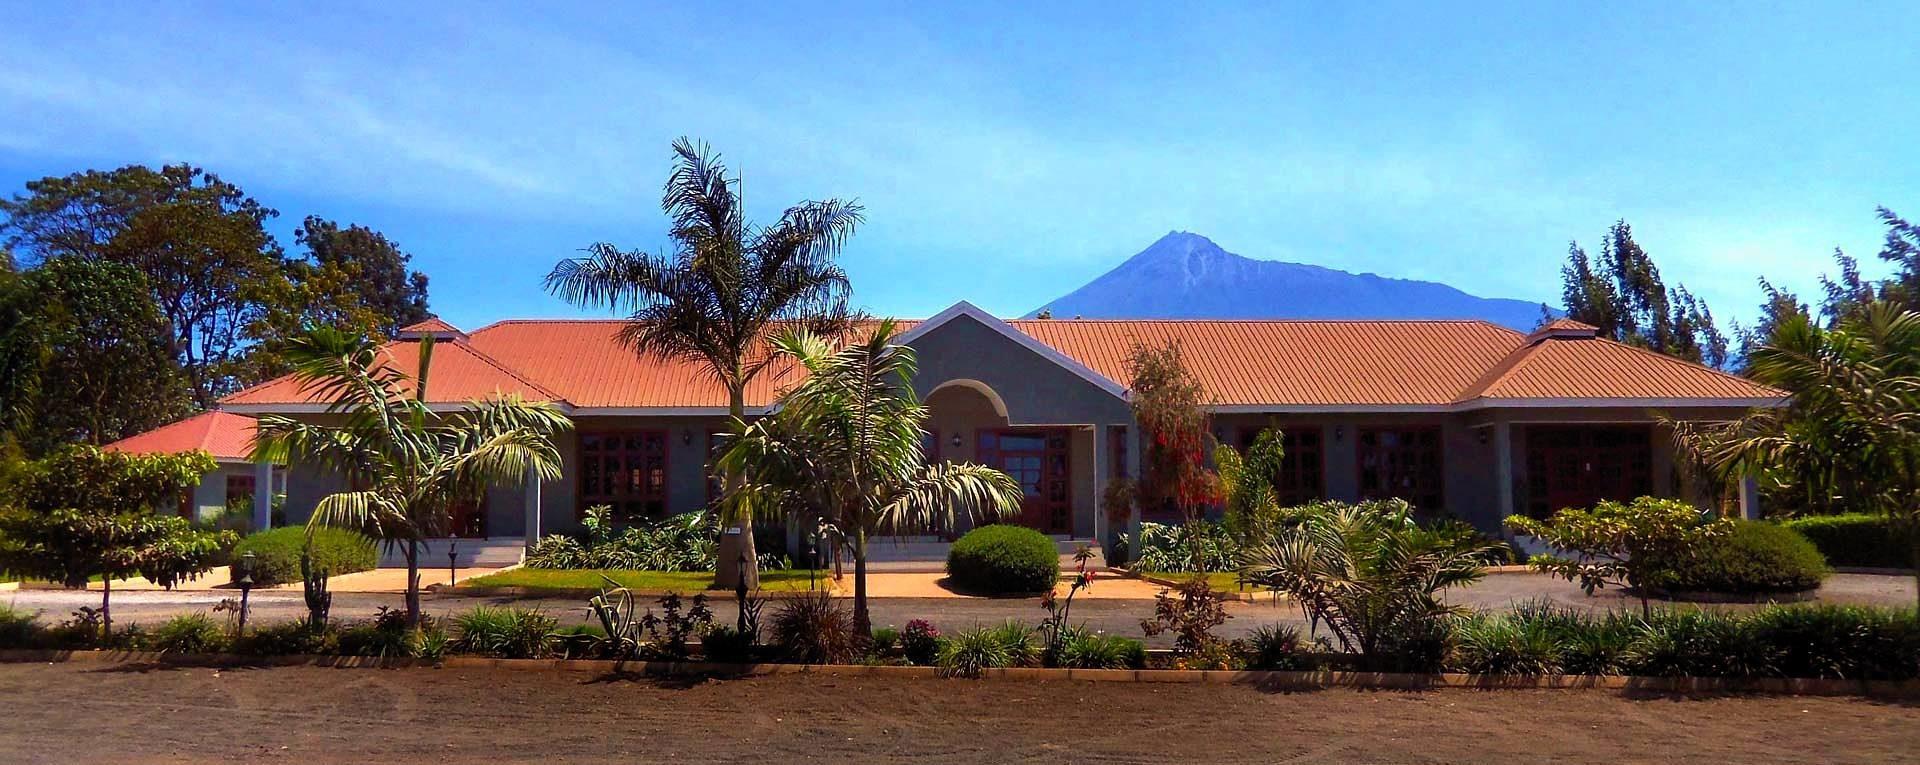 Planet Lodge Arusha main building